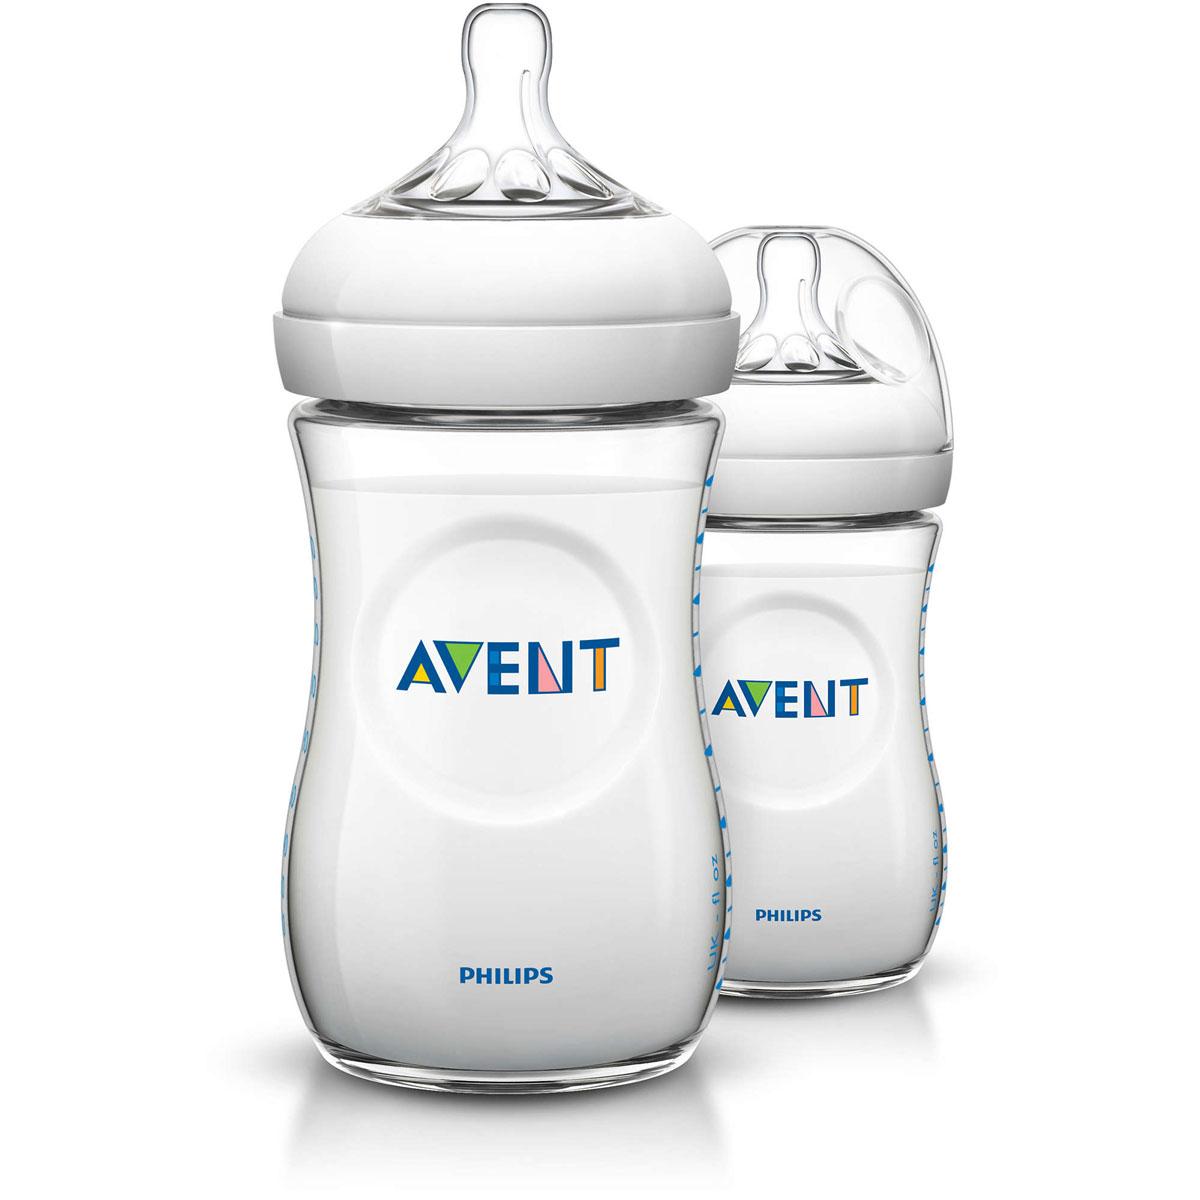 Philips Avent Бутылочка для кормления Natural от 1 месяца 260 мл 2 шт -  Бутылочки